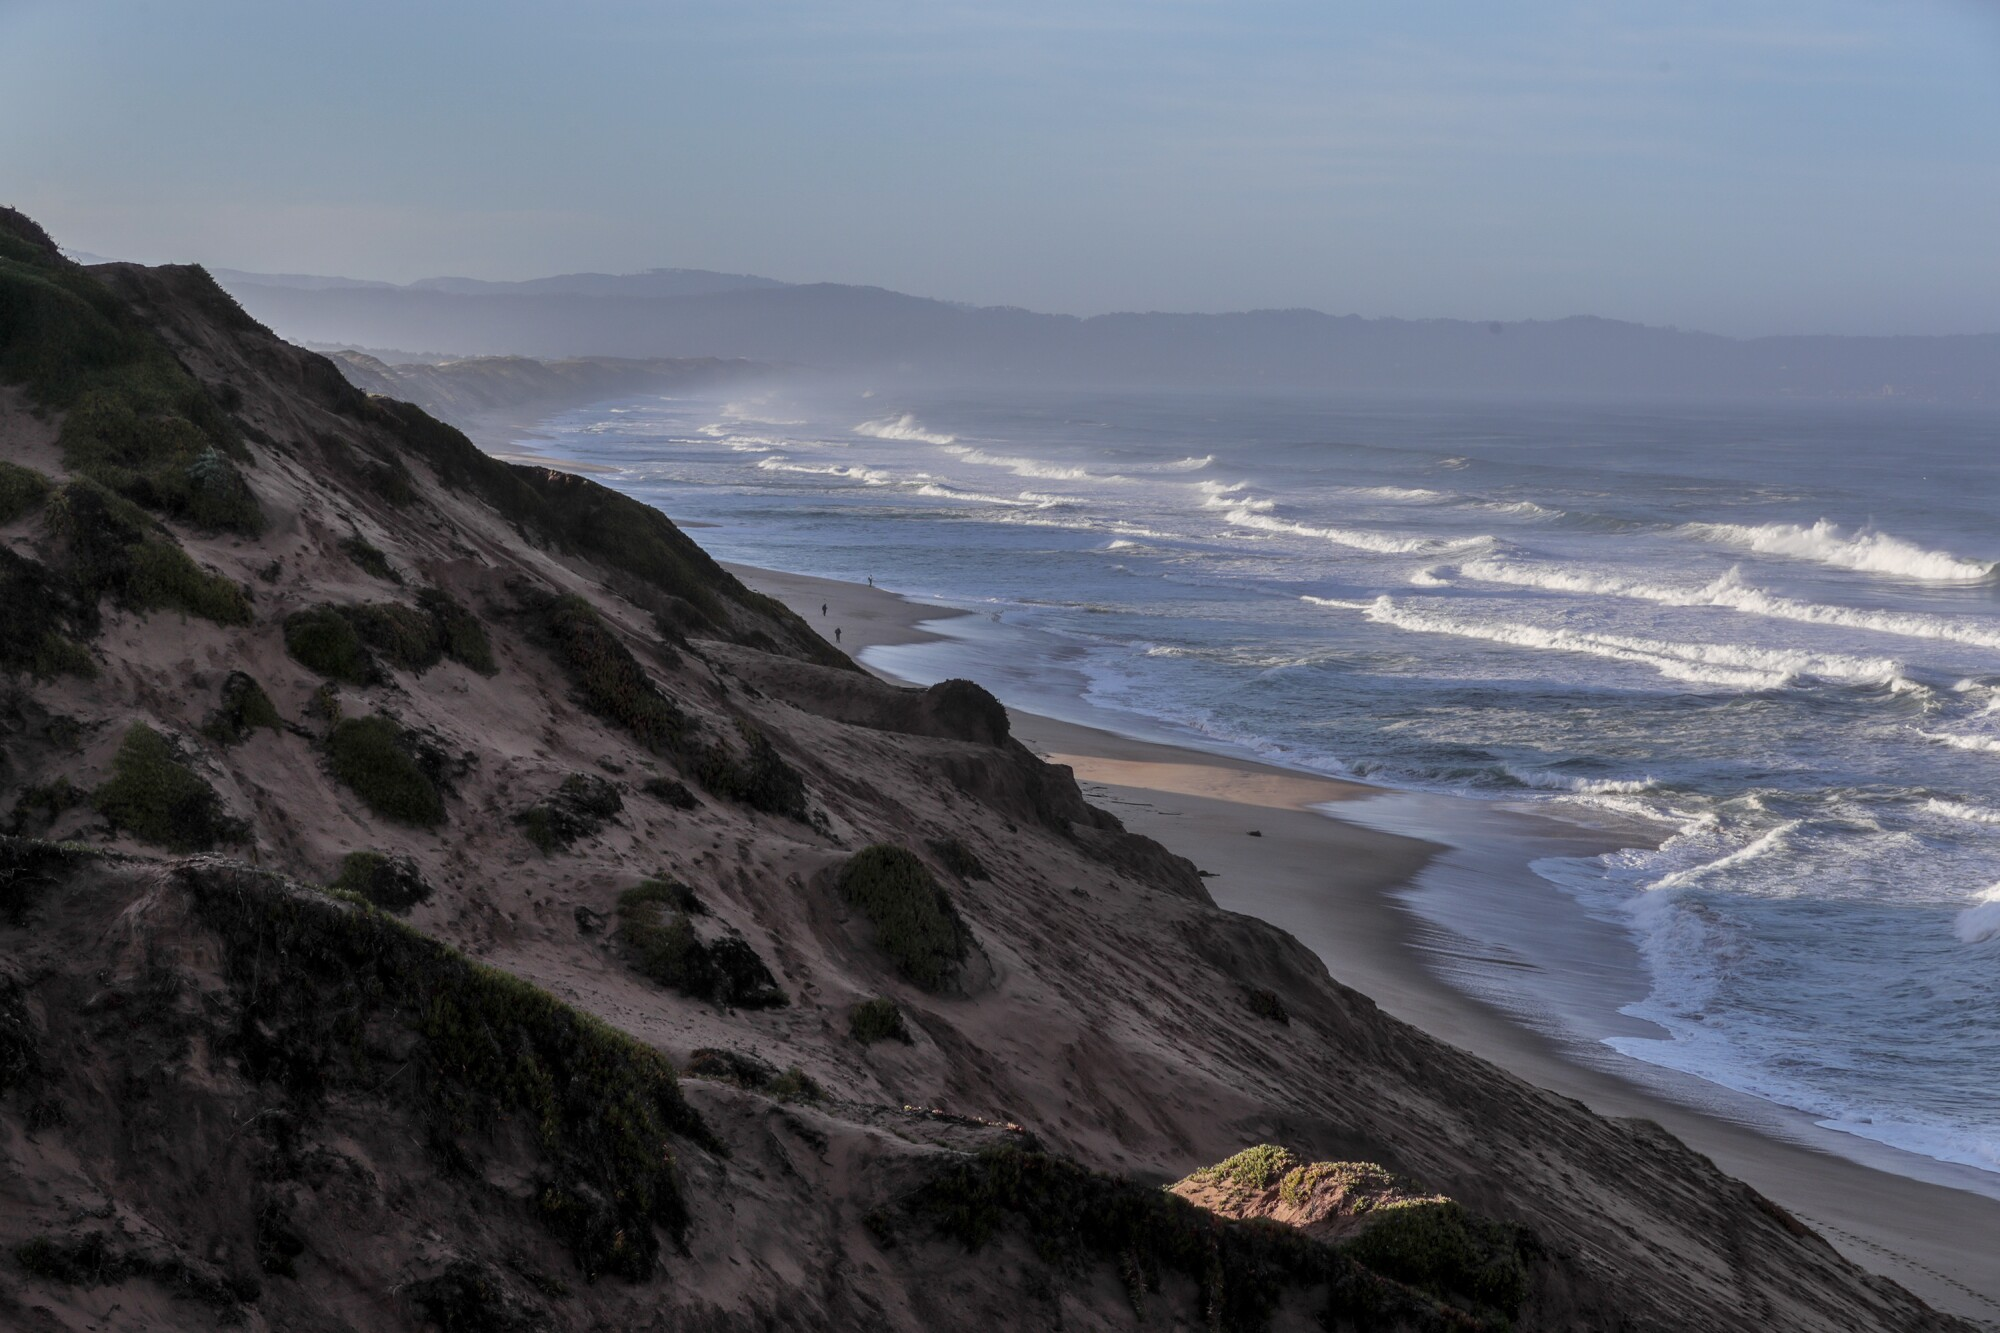 Sea level rise and coastal erosion threaten the beaches and natural sand dunes in Marina, Calif.